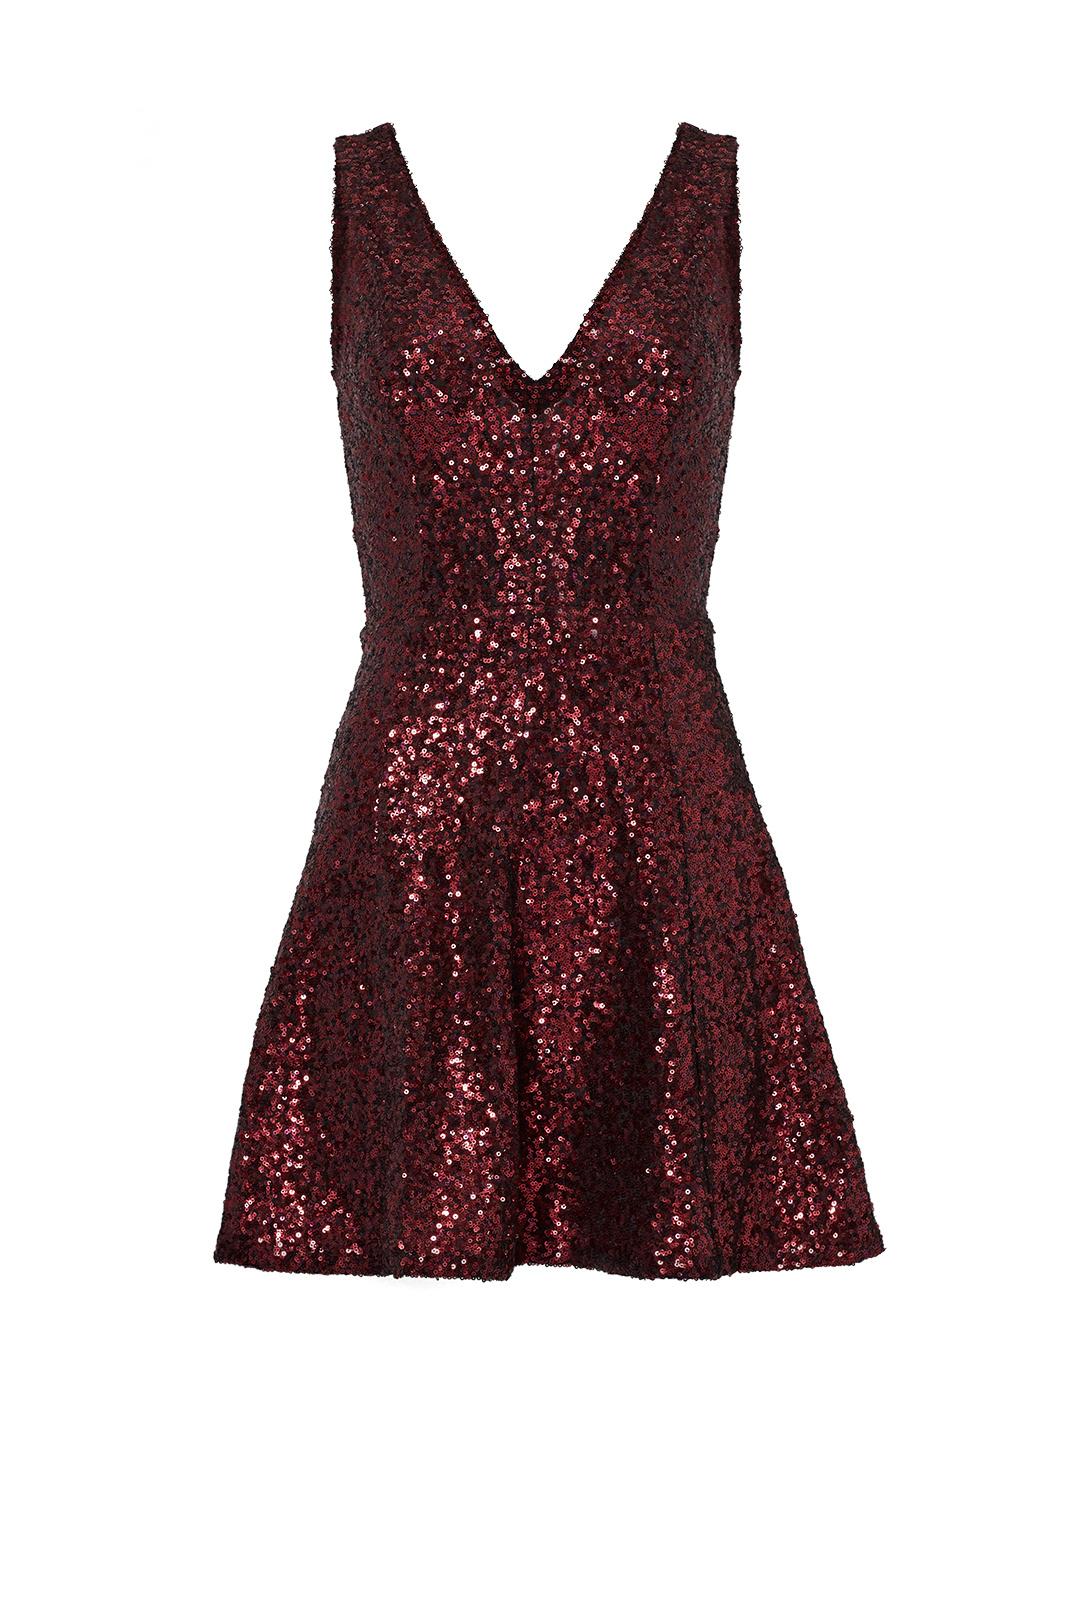 Red Sequin Dress.jpg